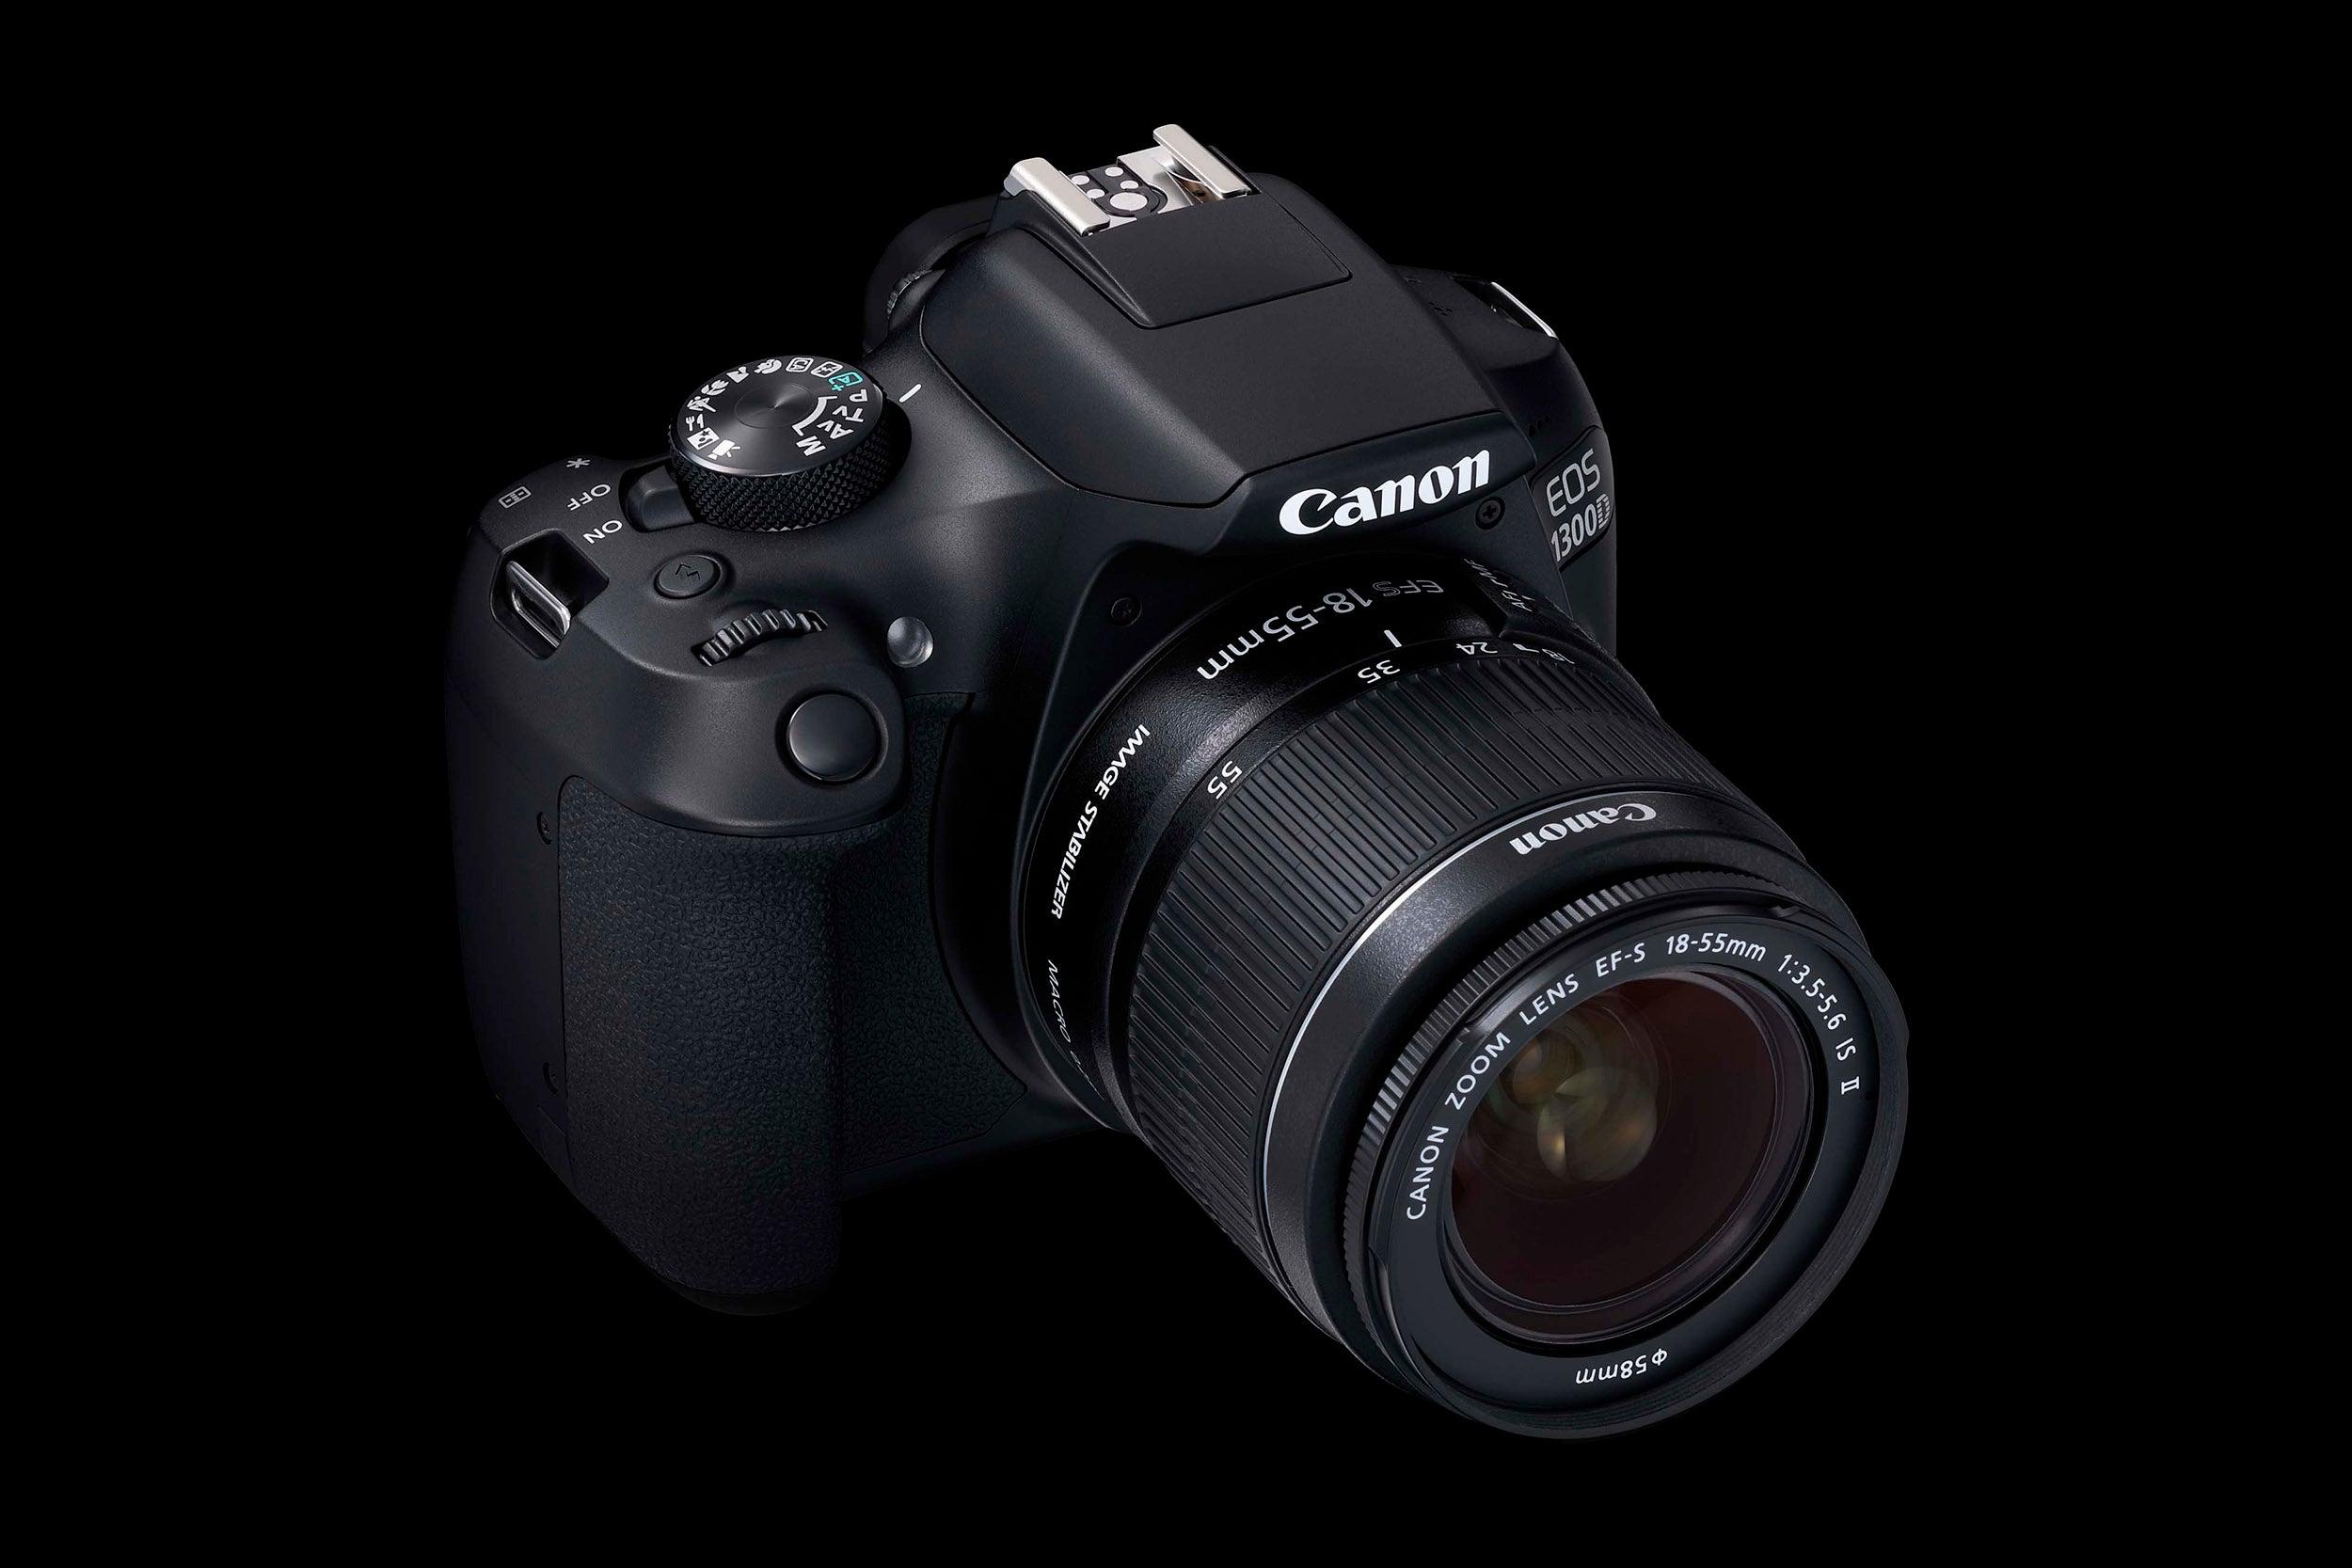 Canon EOS 1300D Key Features